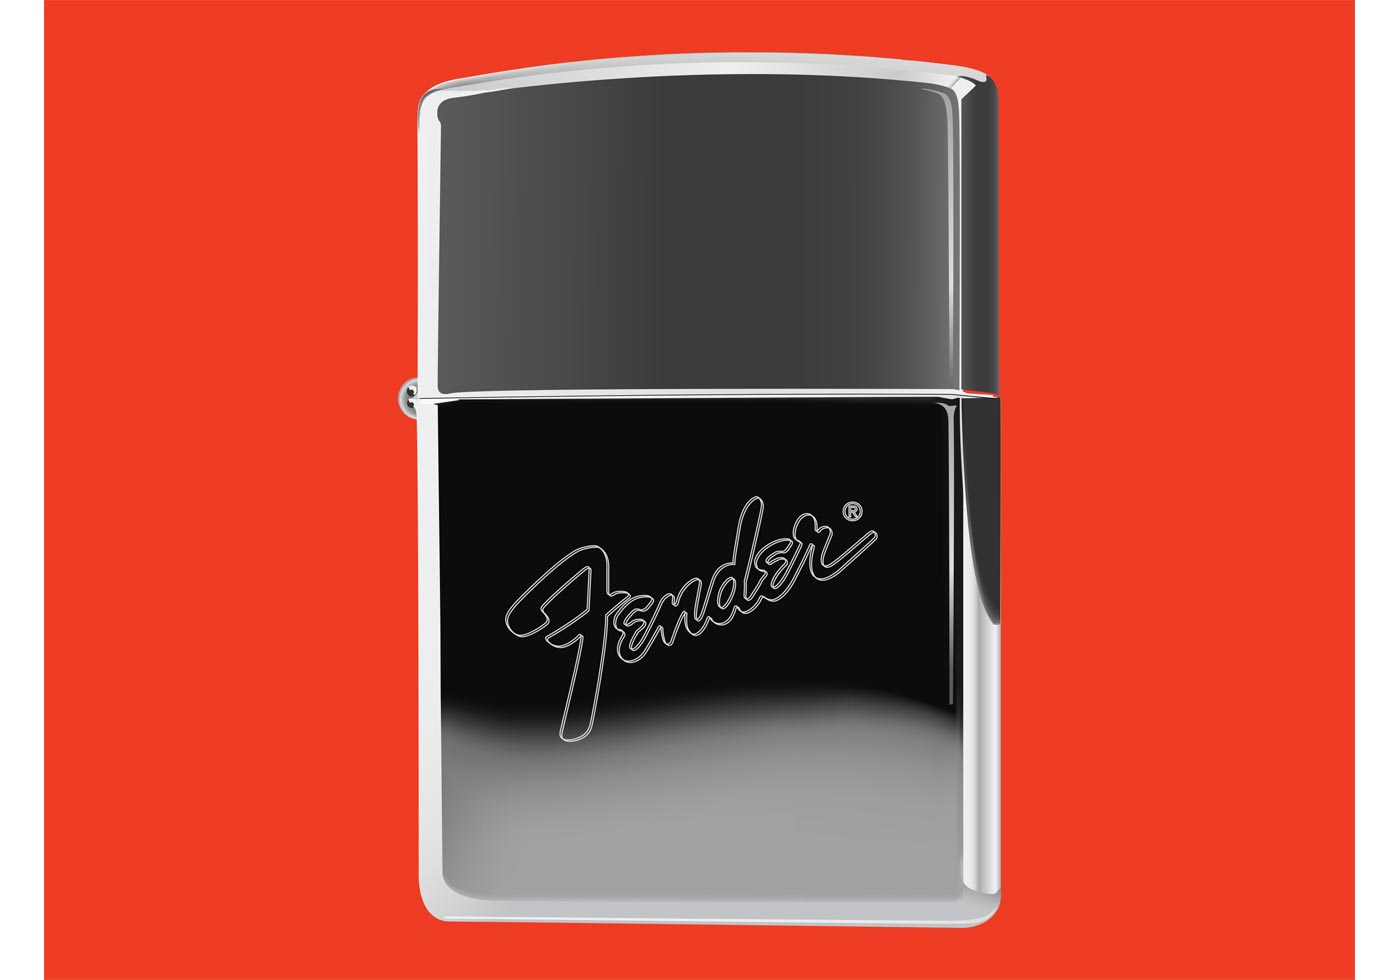 Zippo Lighter With Fender Logo Download Free Vector Art